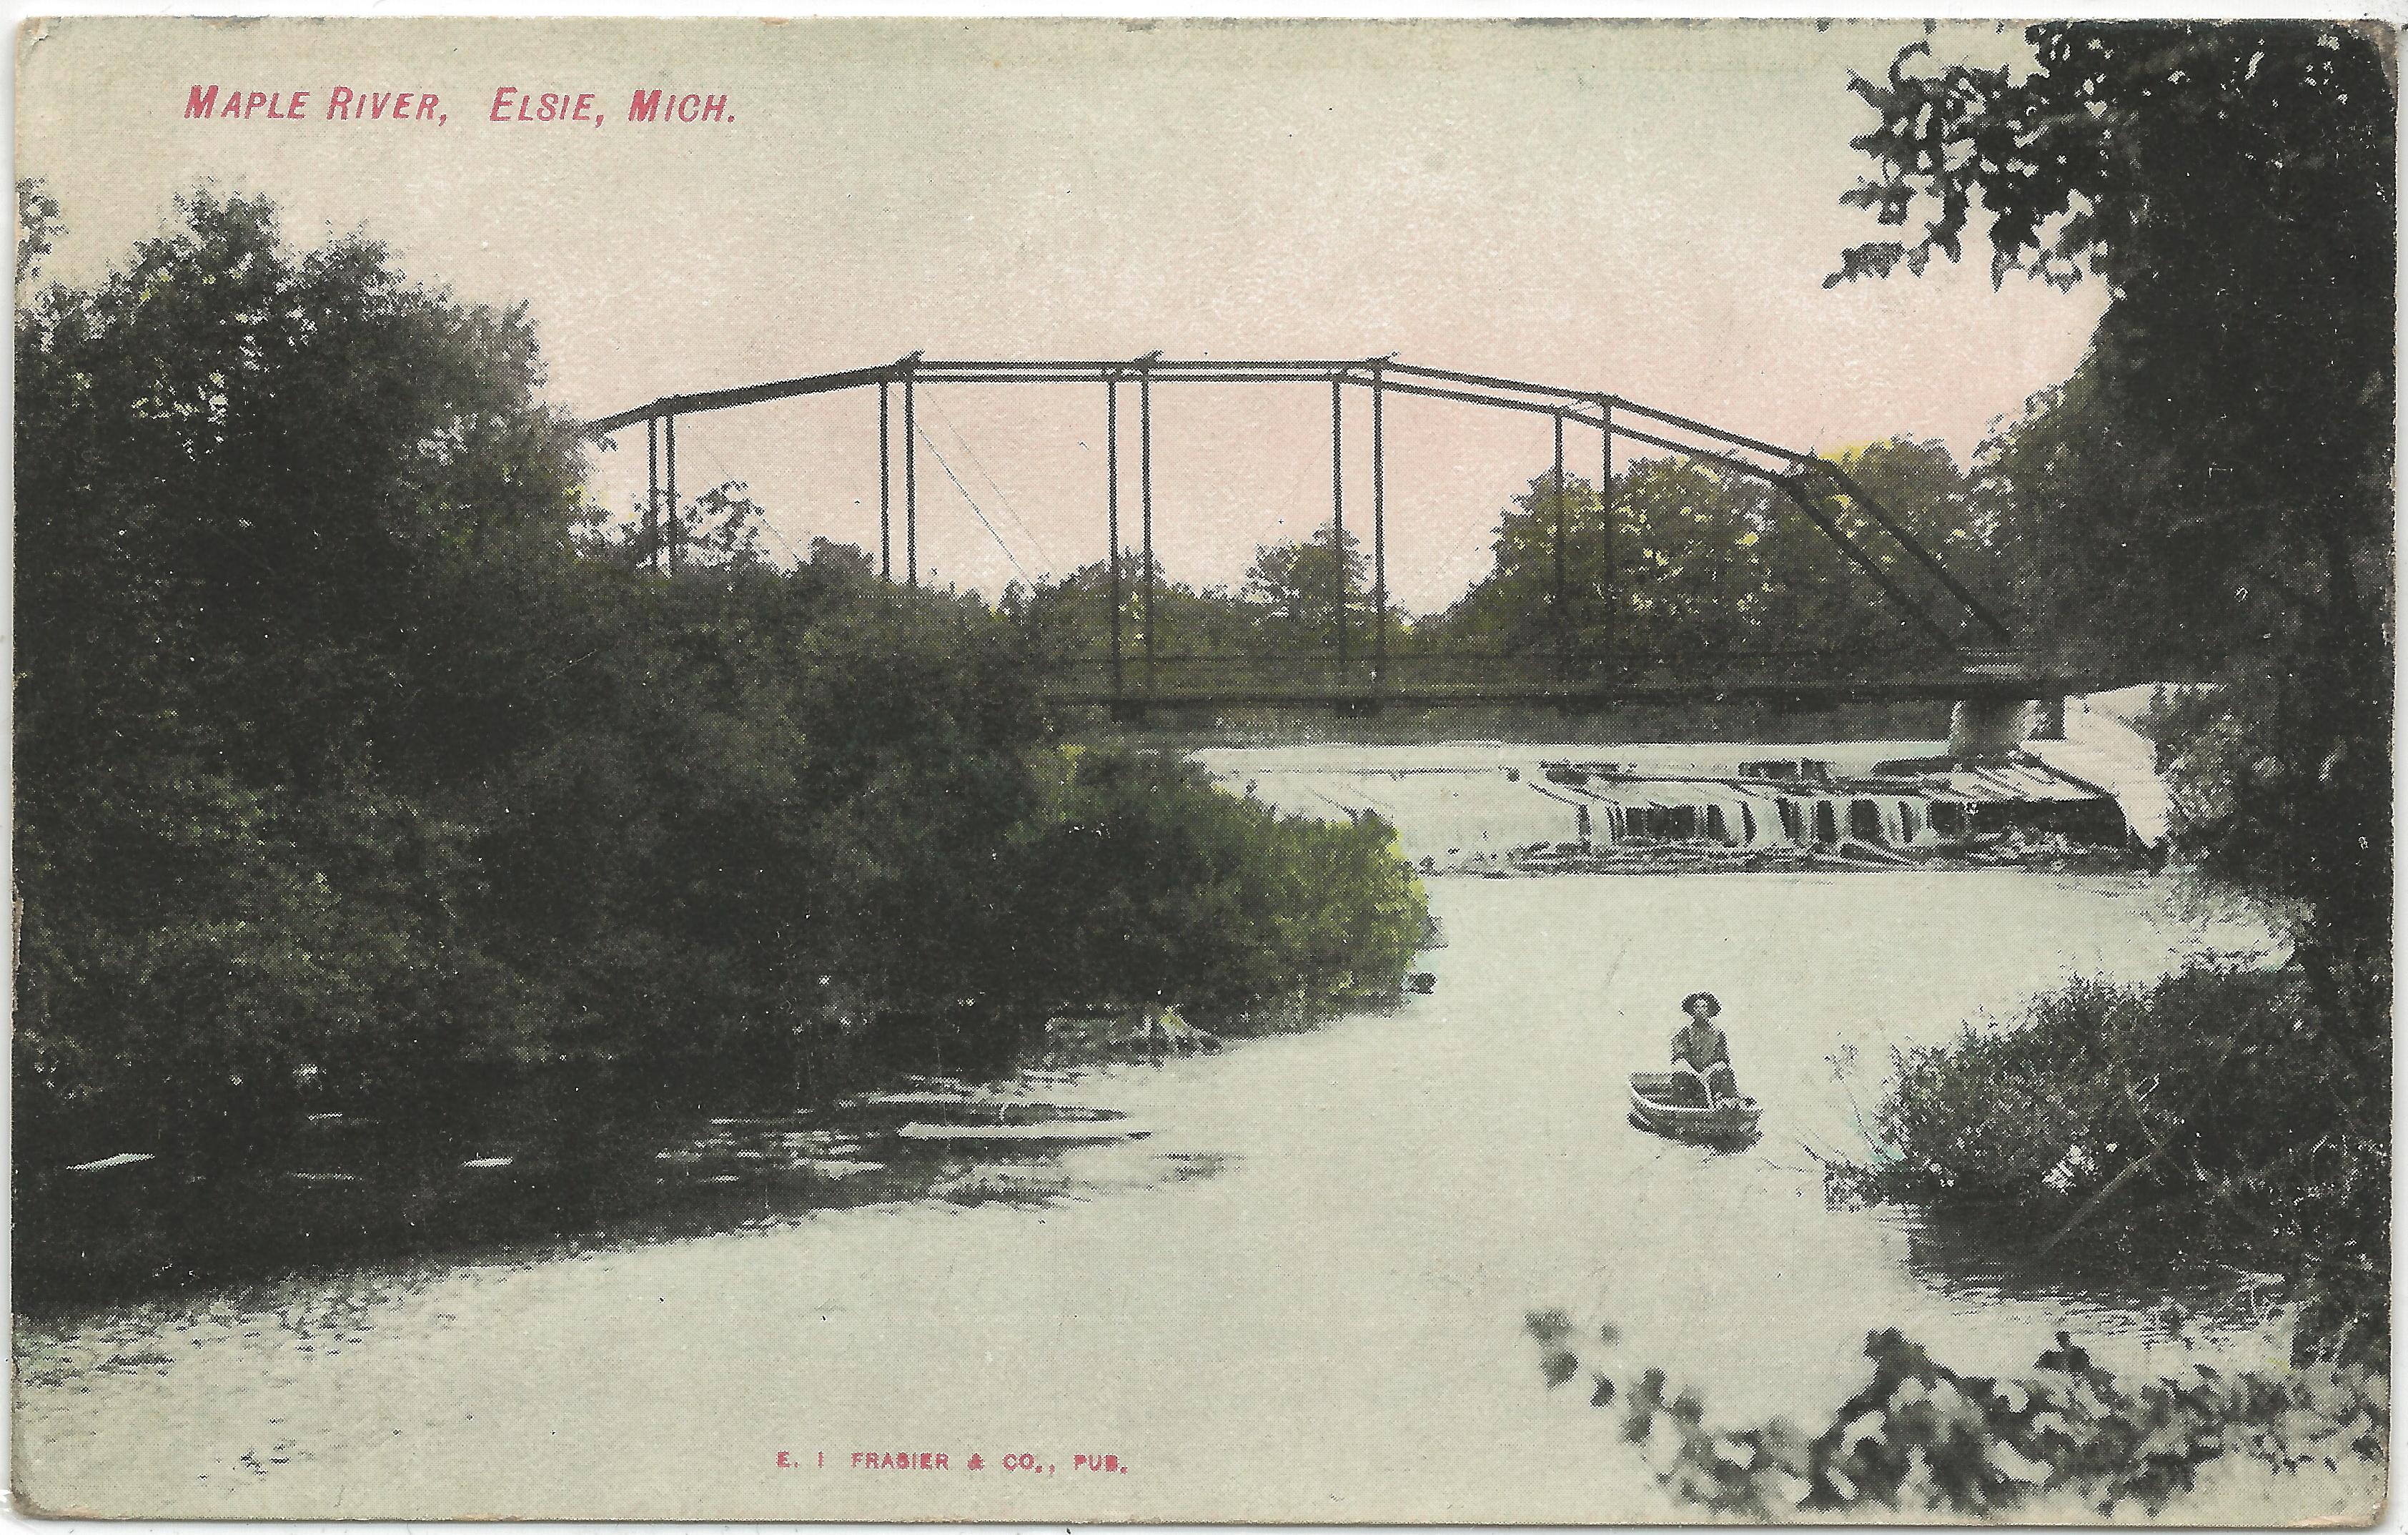 Michigan clinton county elsie - Above Historical Postcard Of Bridge